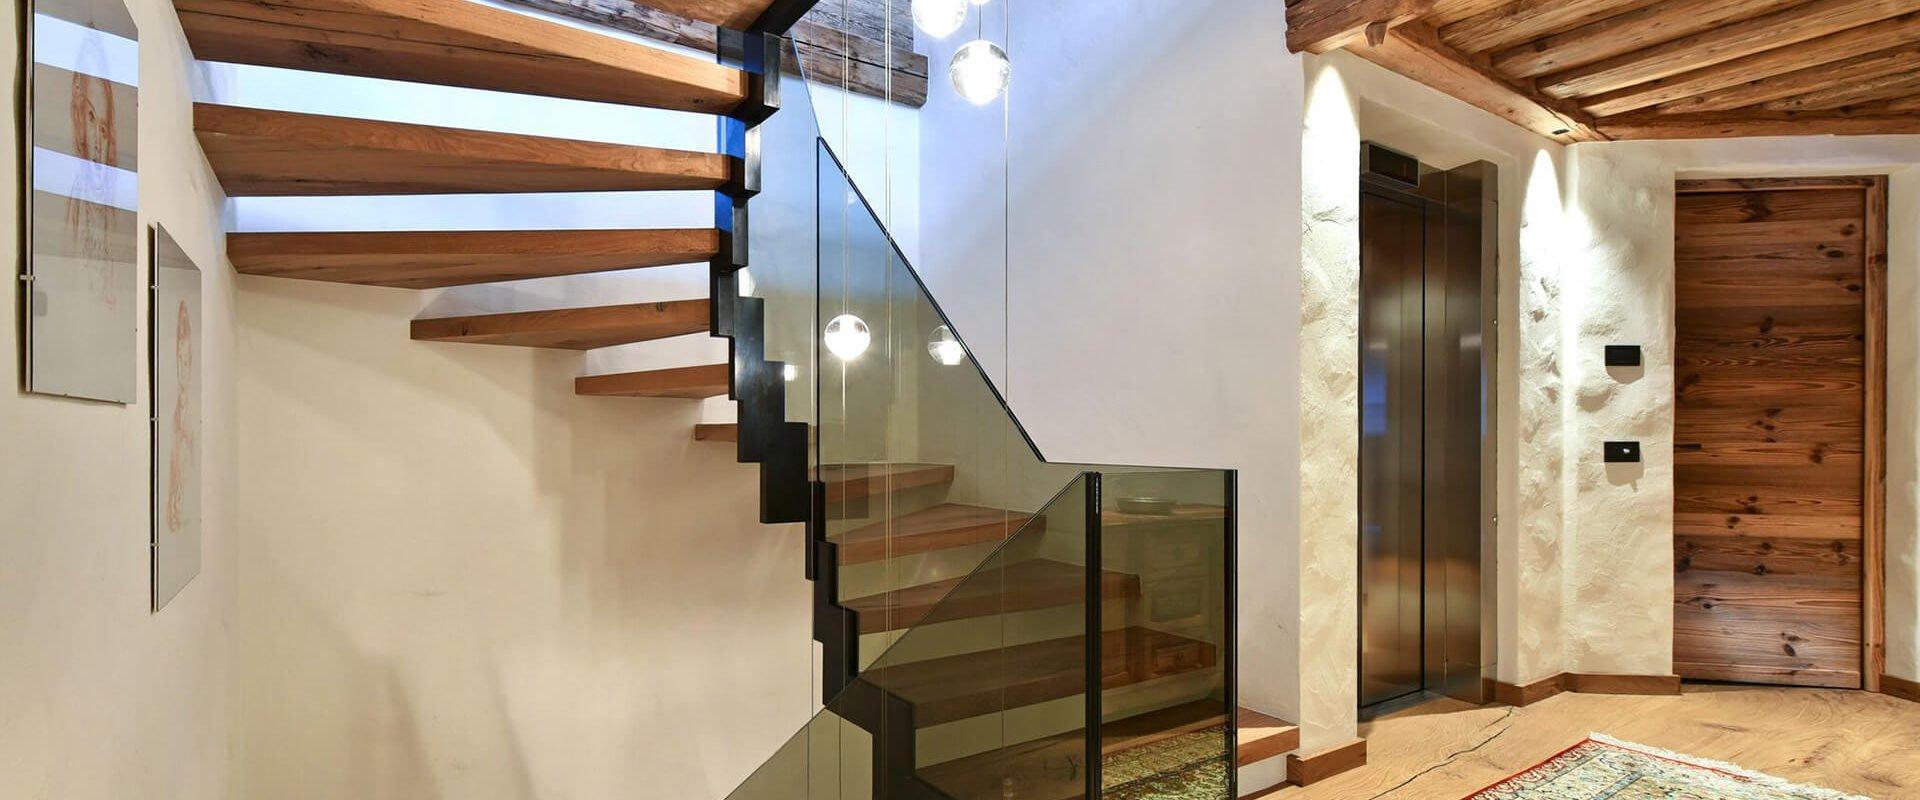 holz glas treppe